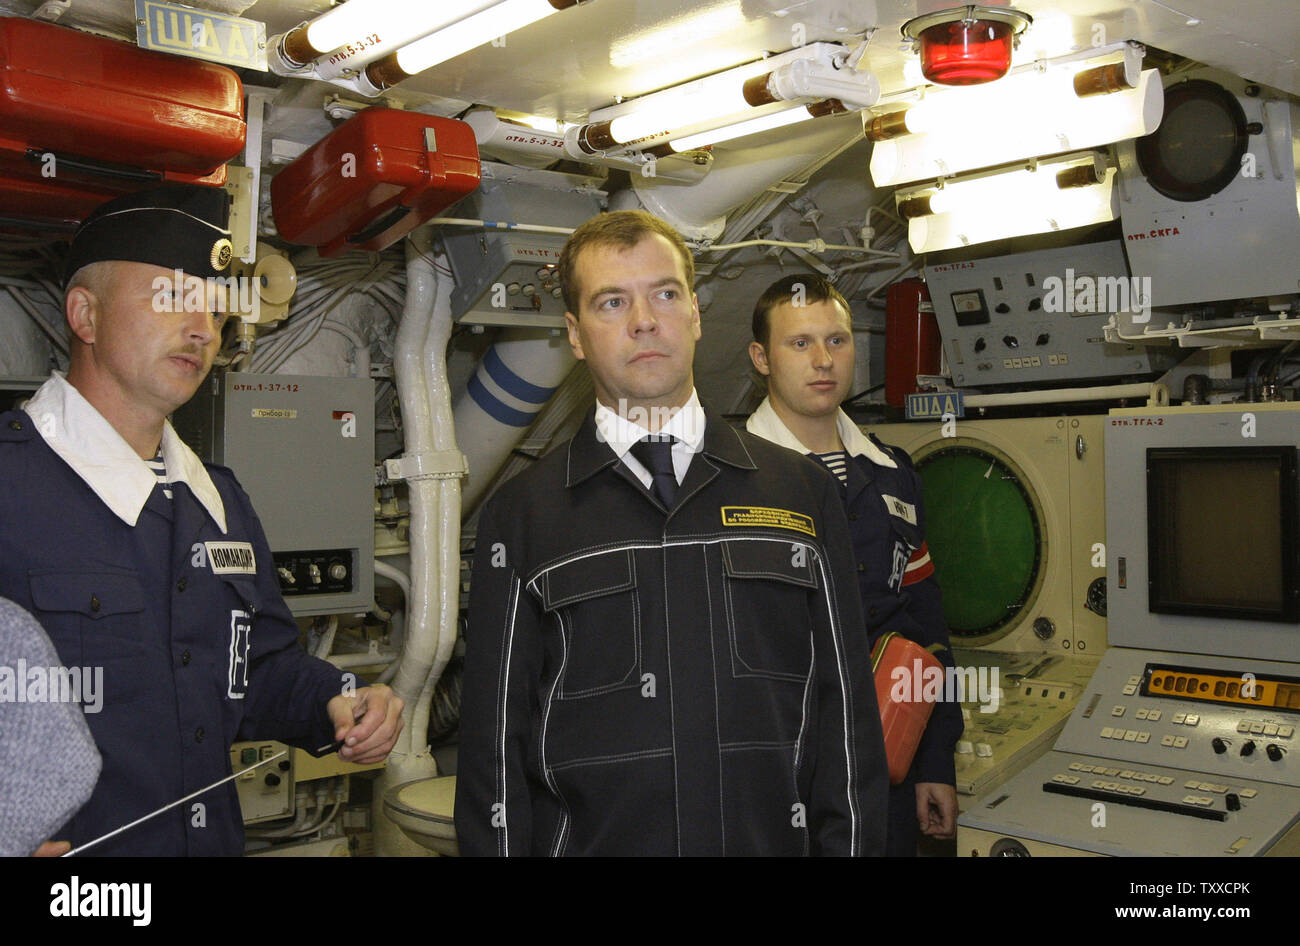 President Dmitry Medvedev (C) wearing NAVY uniform visits the 'St. George the Victor' nuclear powered submarine at the Russian Pacific Fleet submarine base at Krasheninnikov Harbor on the Kamchatka Peninsula in the Russian Far East on September 25, 2008. (UPI Photo/Anatoli Zhdanov) - Stock Image